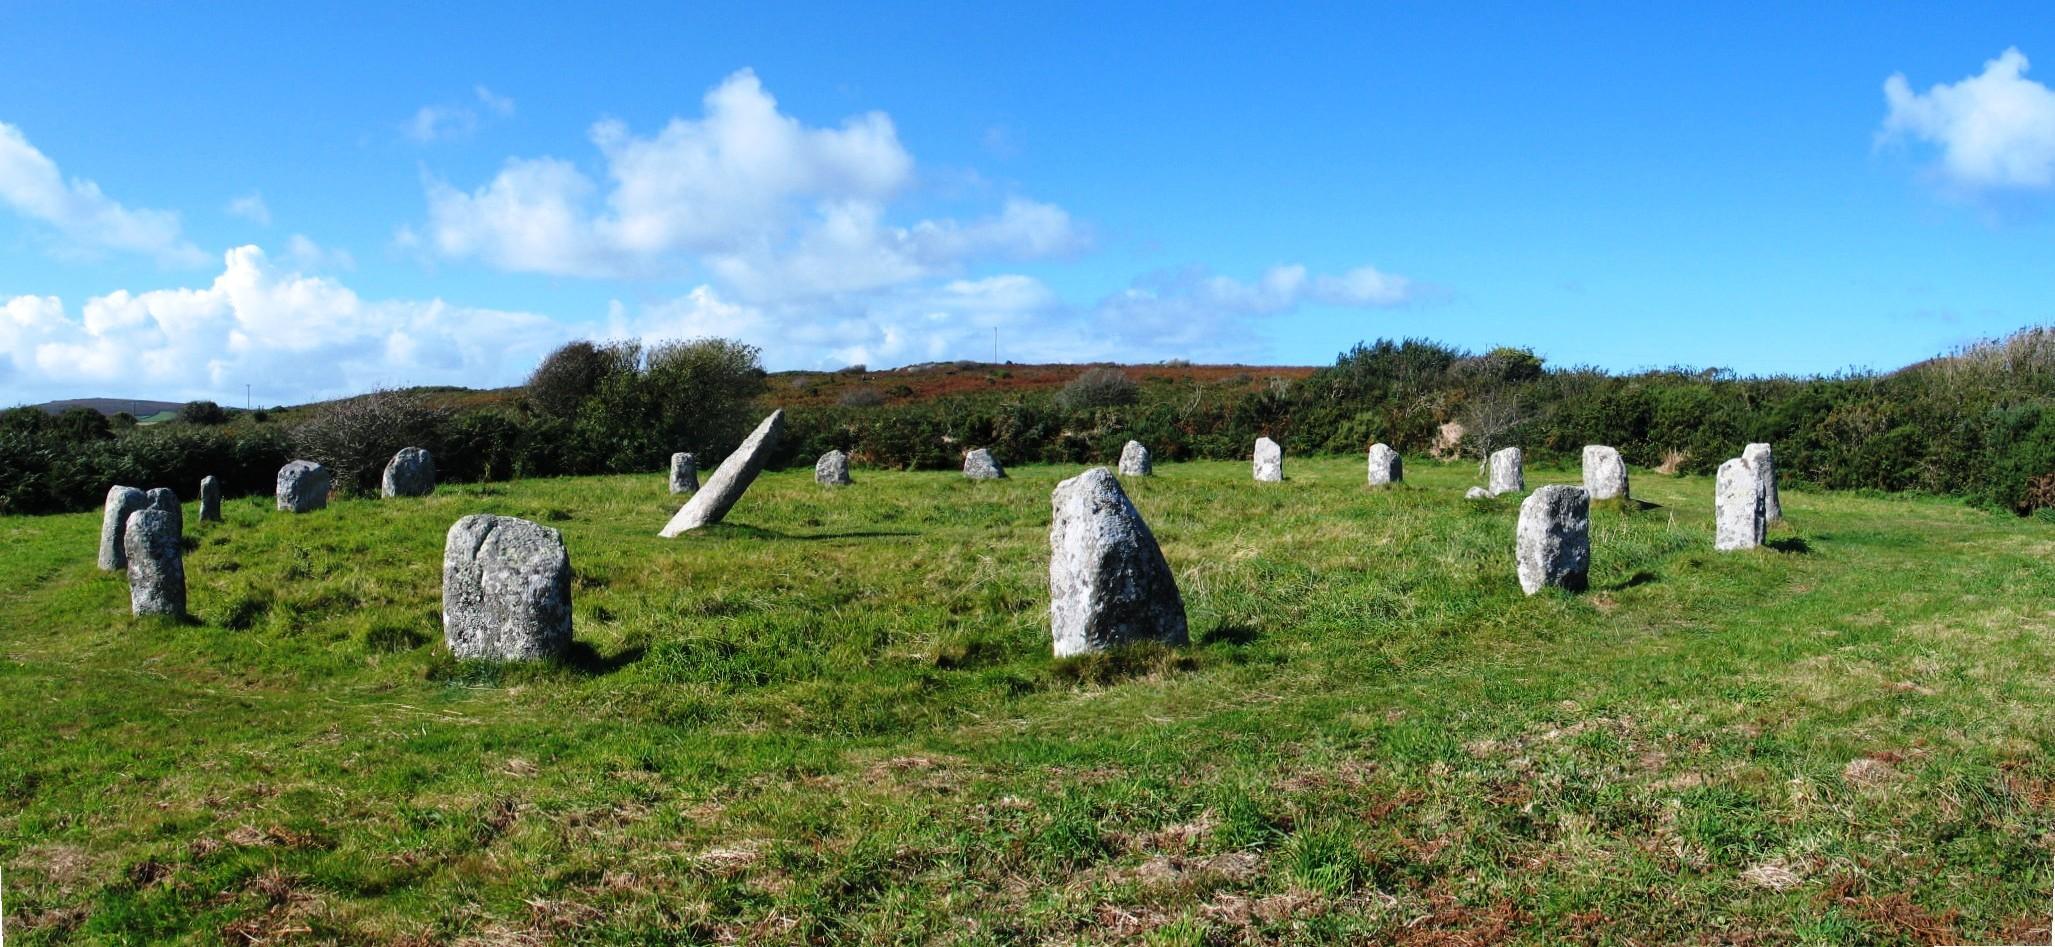 Boscawnen-un stone cicle